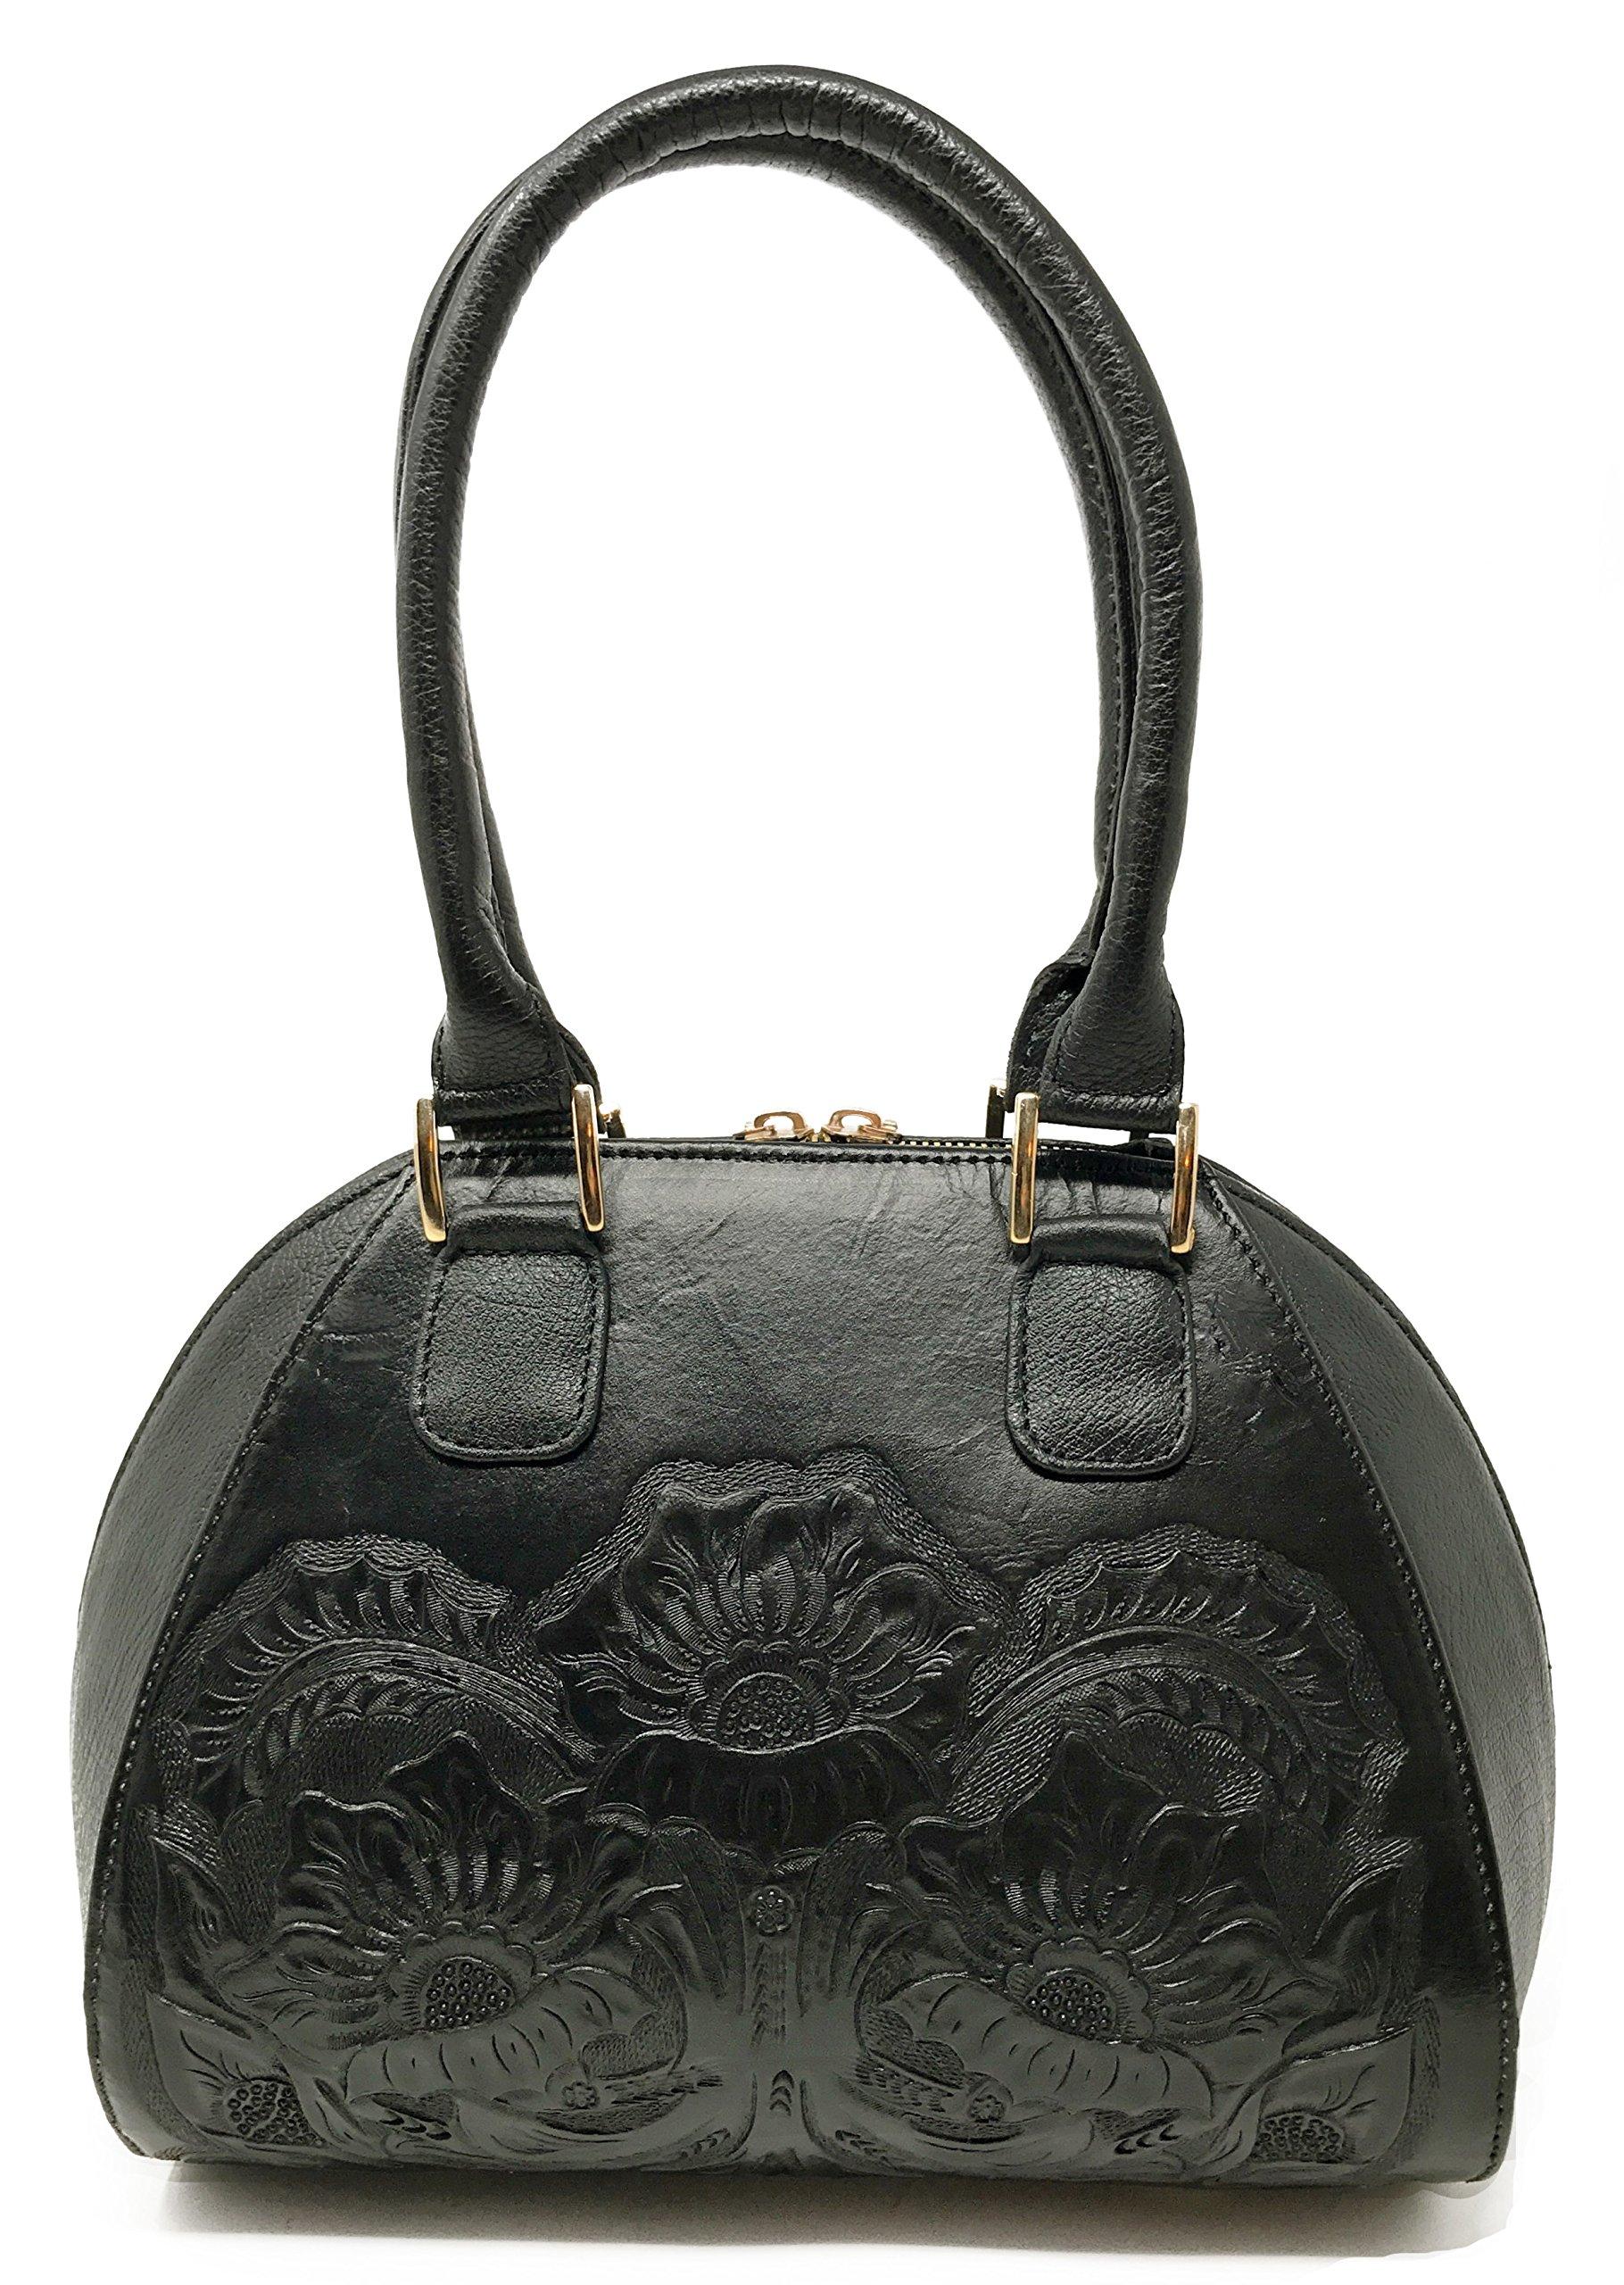 Alexandria Vintage Floral Artisan Leather Handmade Top Handle CrossBody Handbag Designer Gift for Women (Obsidian)